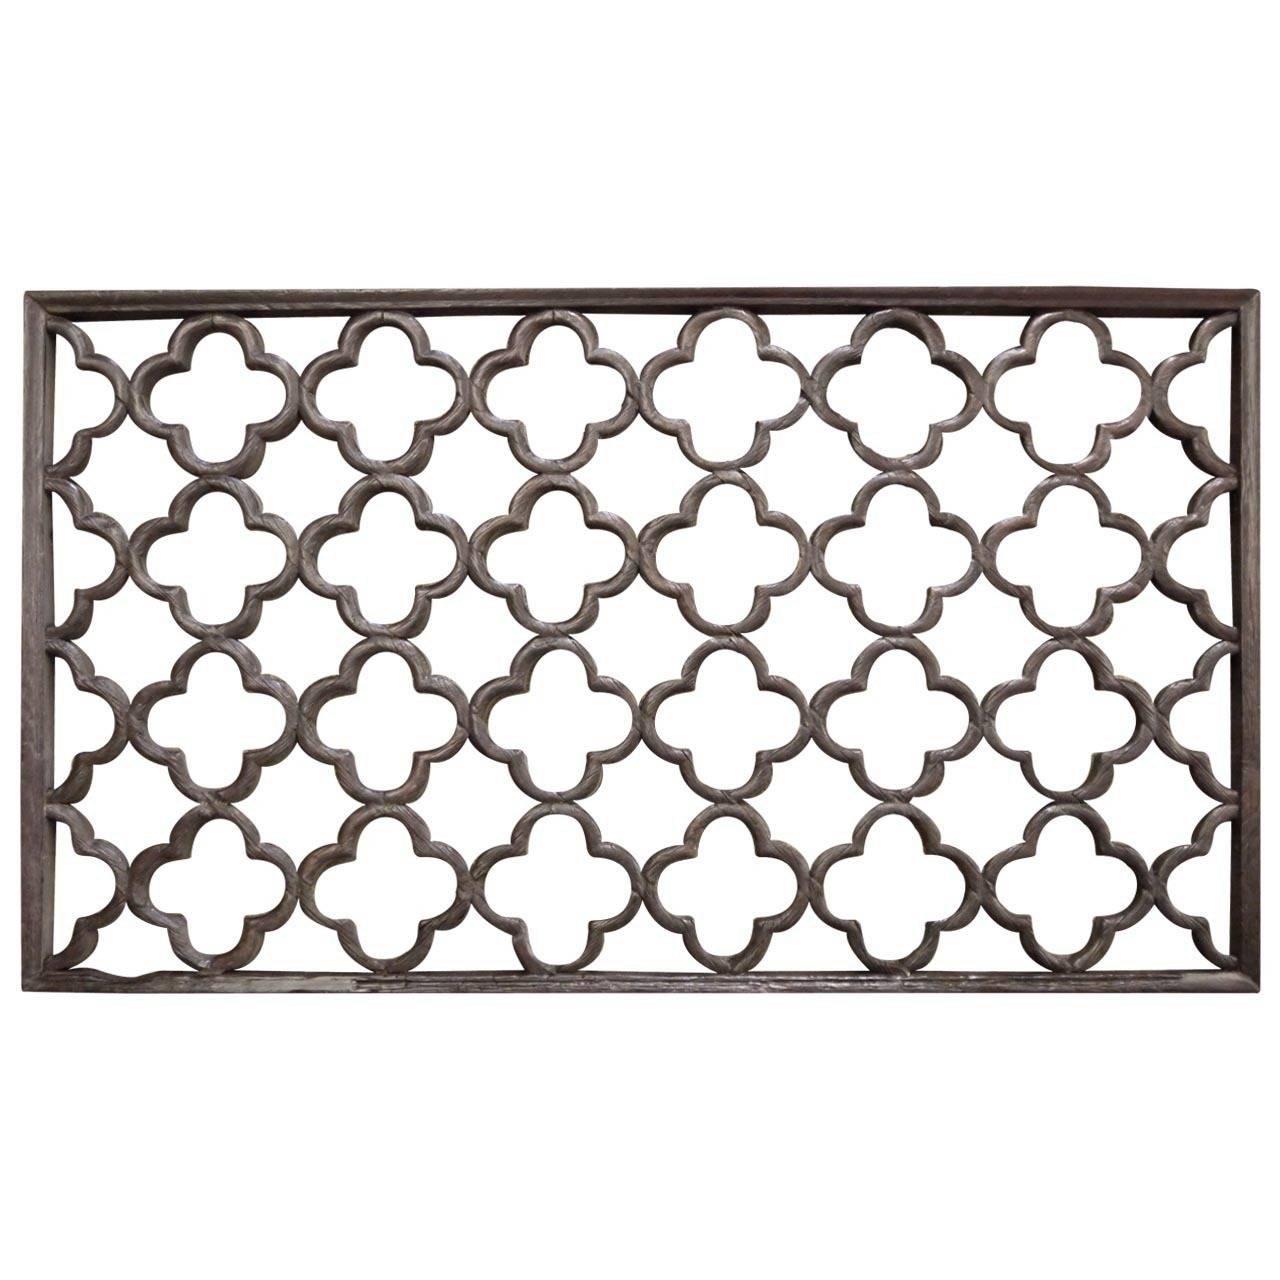 19th century chinese lattice window panel at 1stdibs for Lattice screen